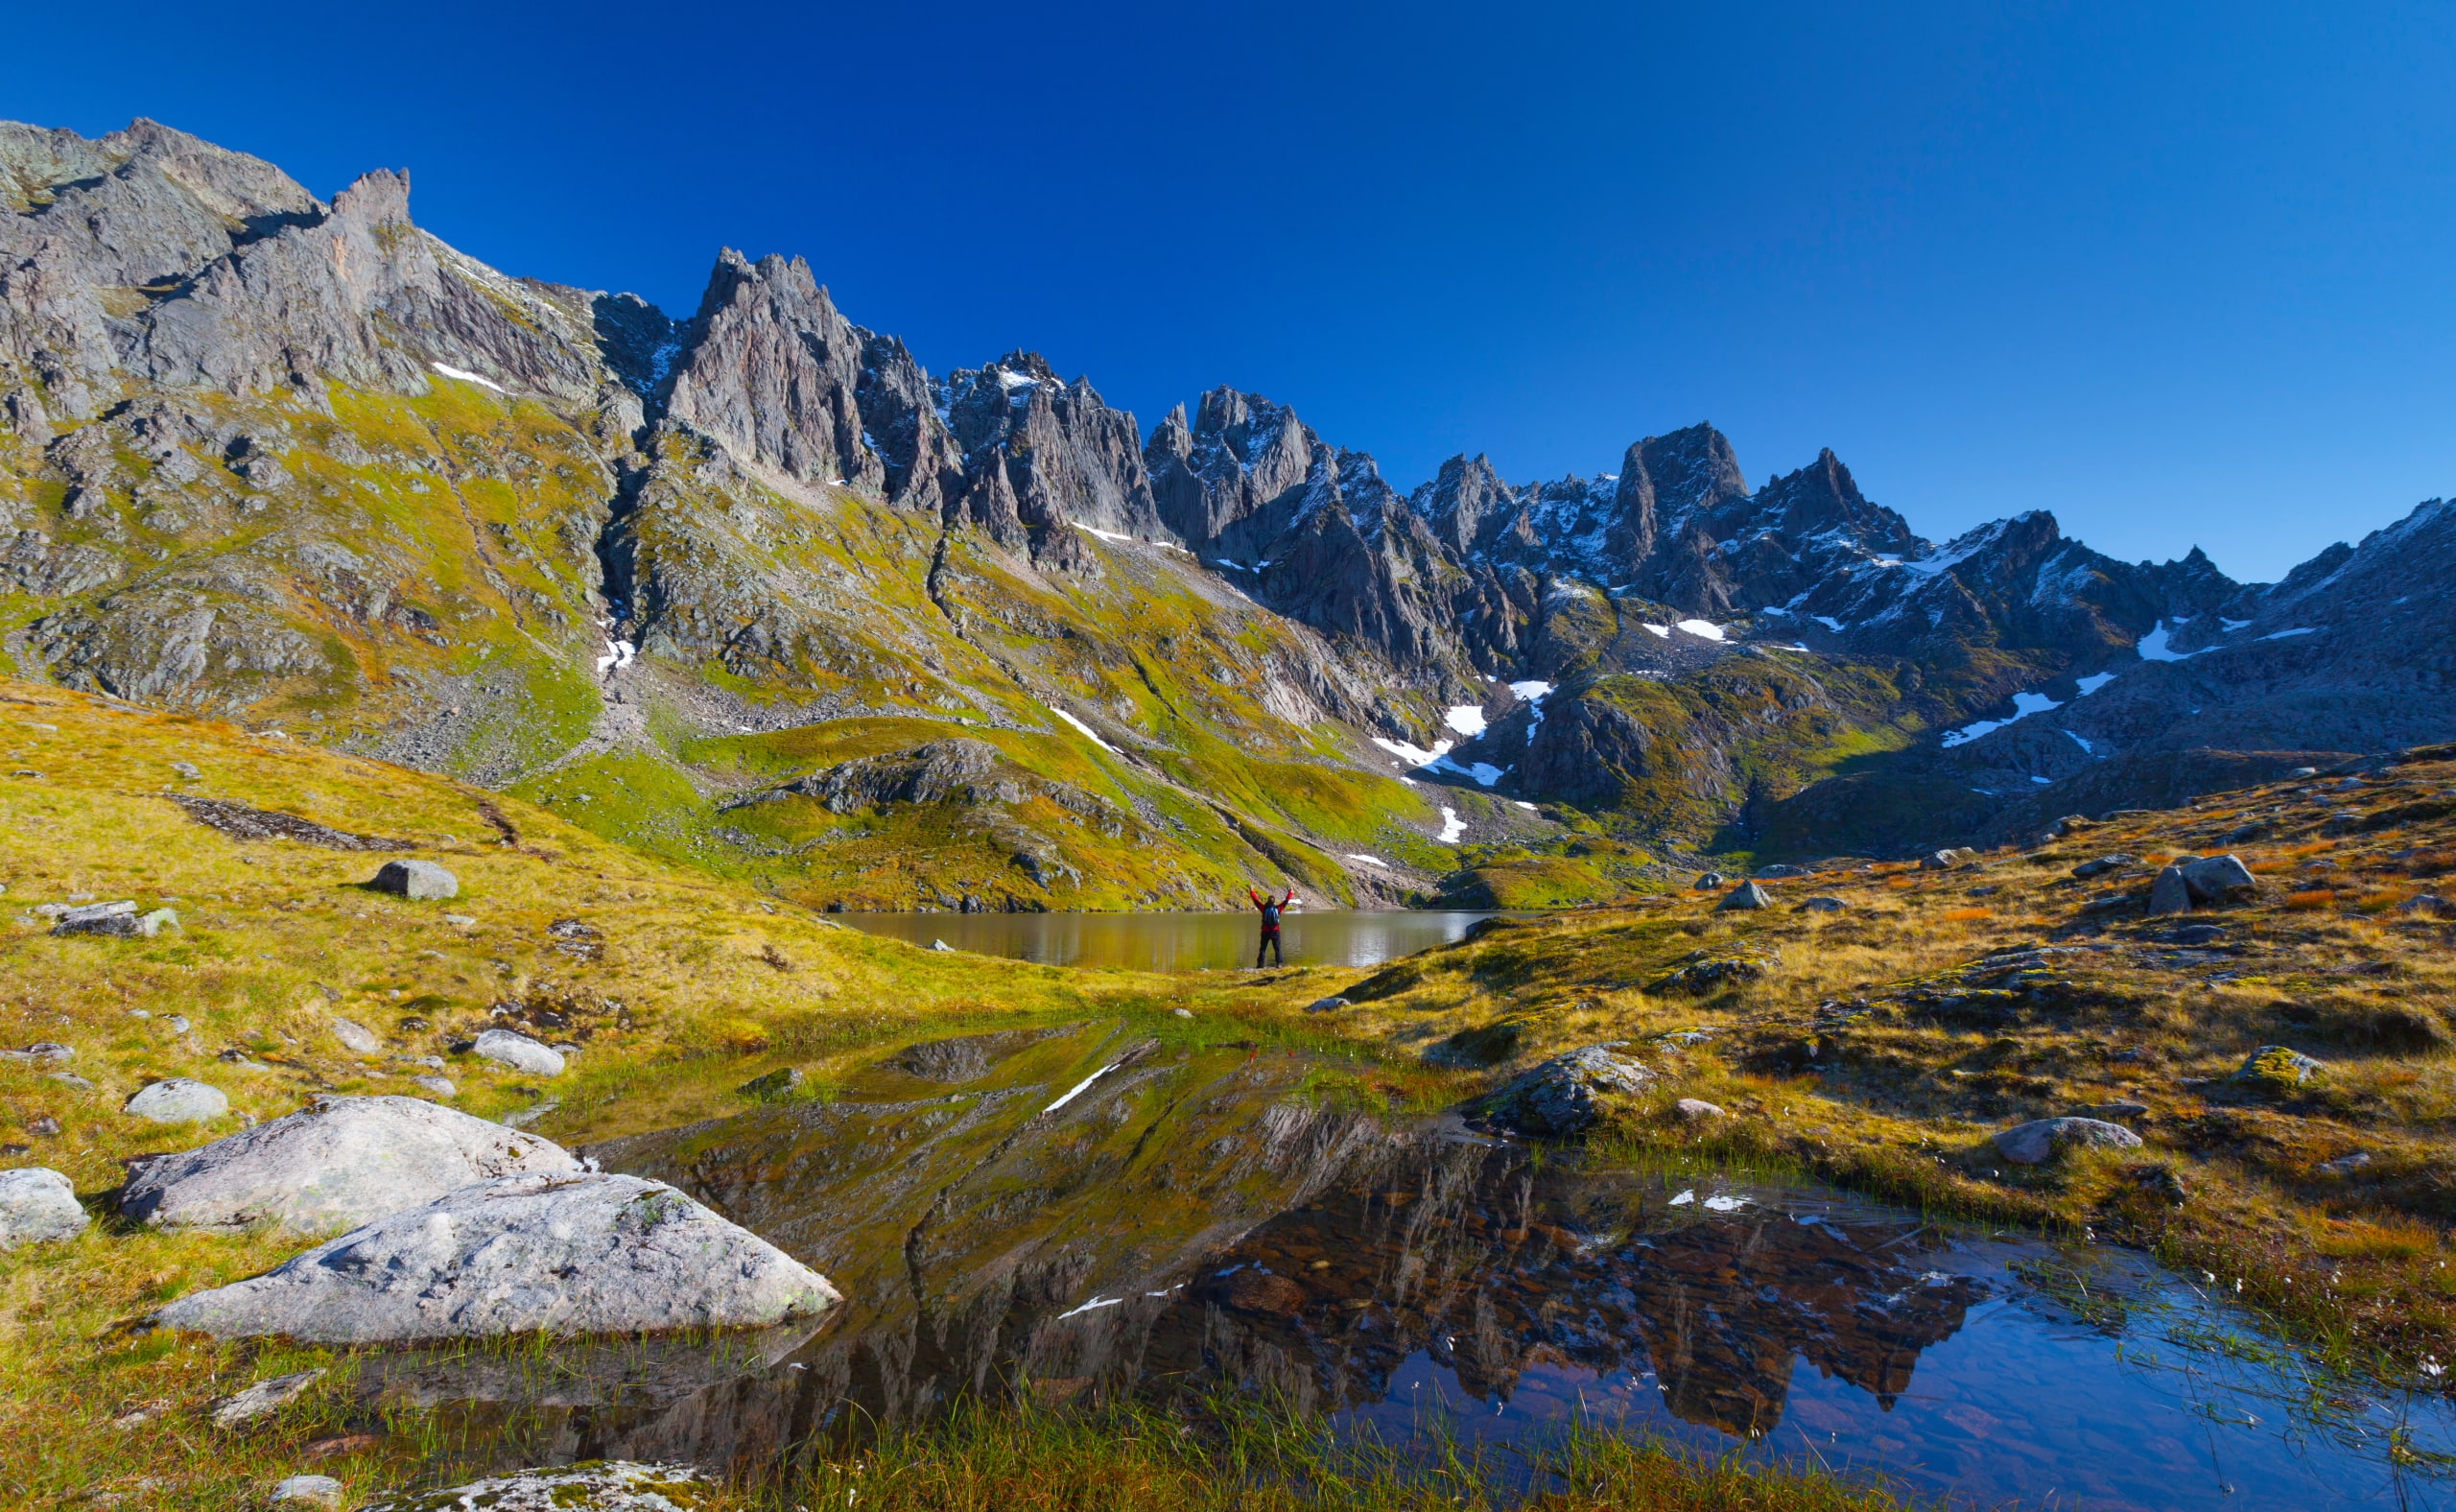 Storevatnet in Molladalen in Sunnmøre Alps